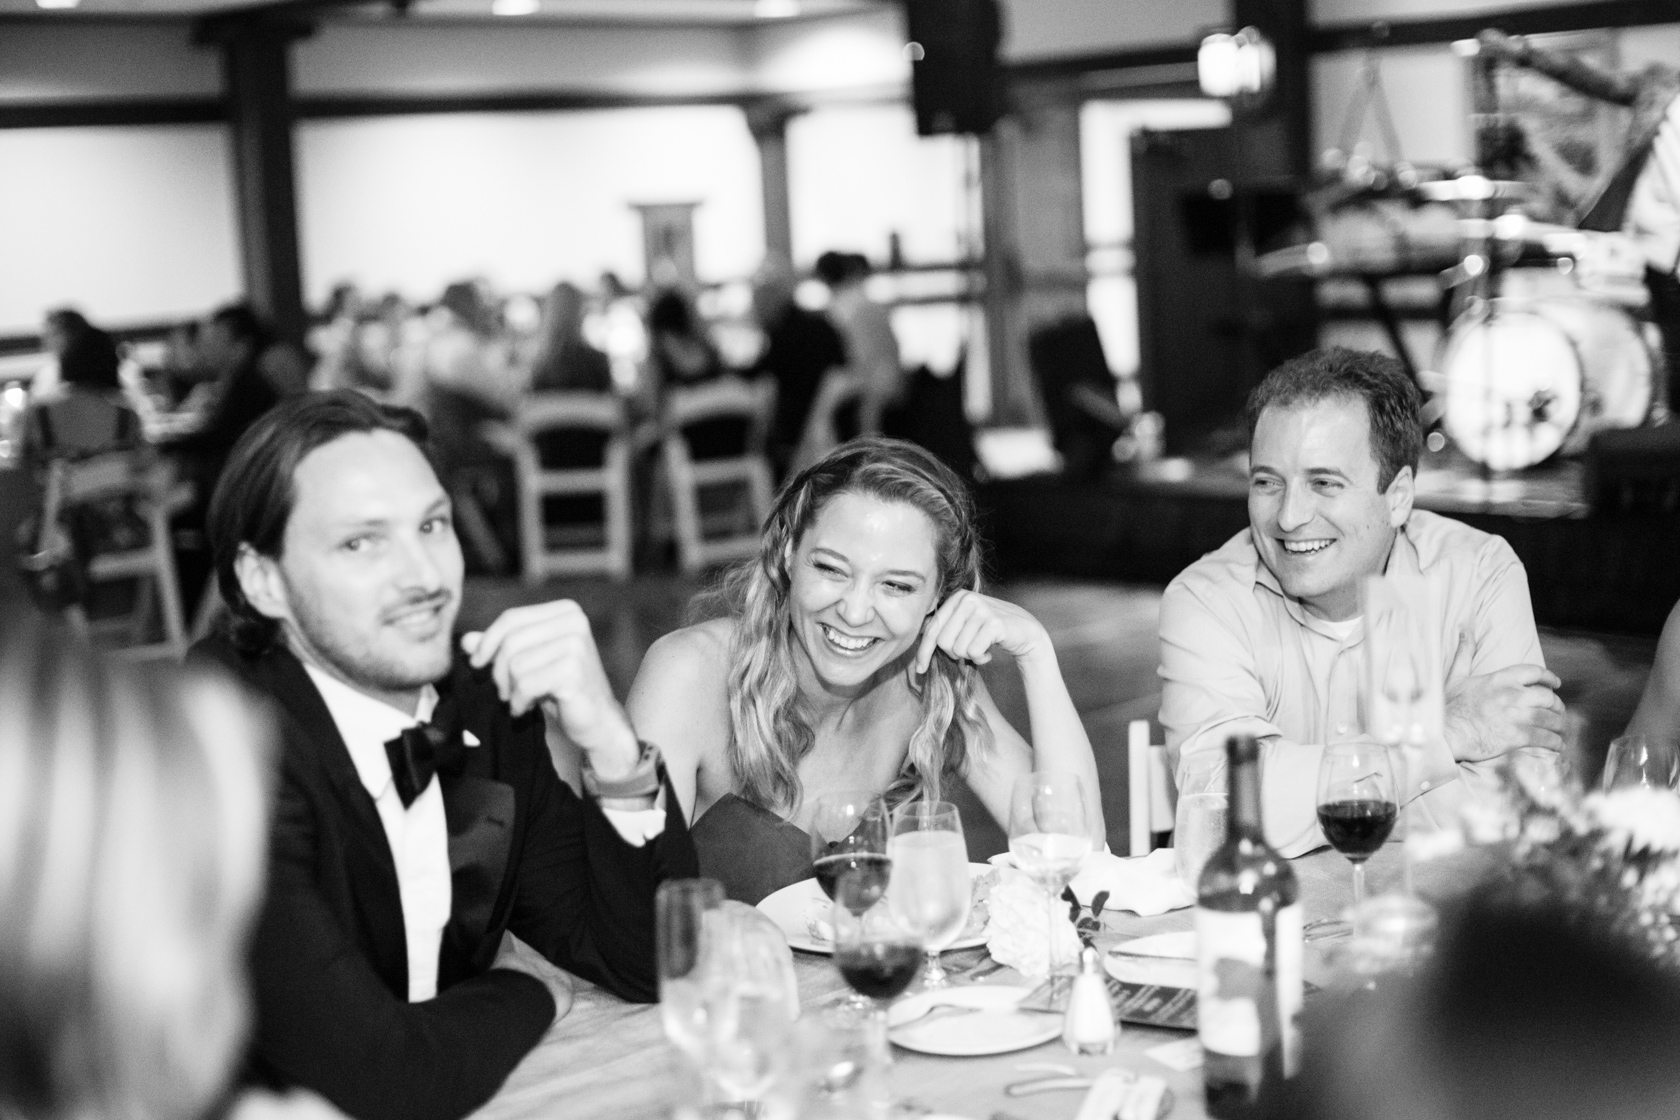 The_Lodge_at_Torrey_Pines_Wedding_113.jpg